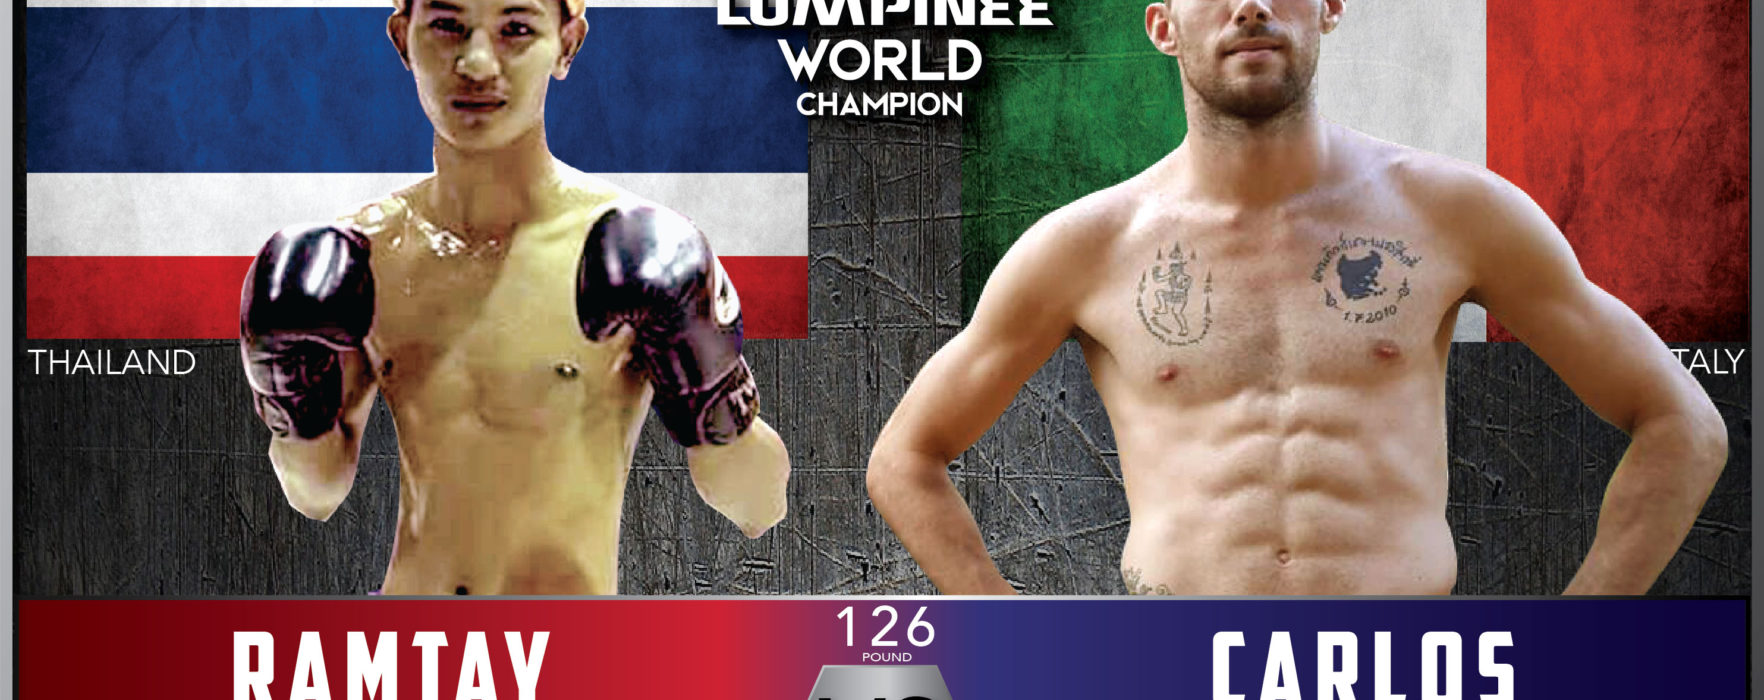 """Lumpinee World Champion"" every Saturday at Lumpinee Stadium"